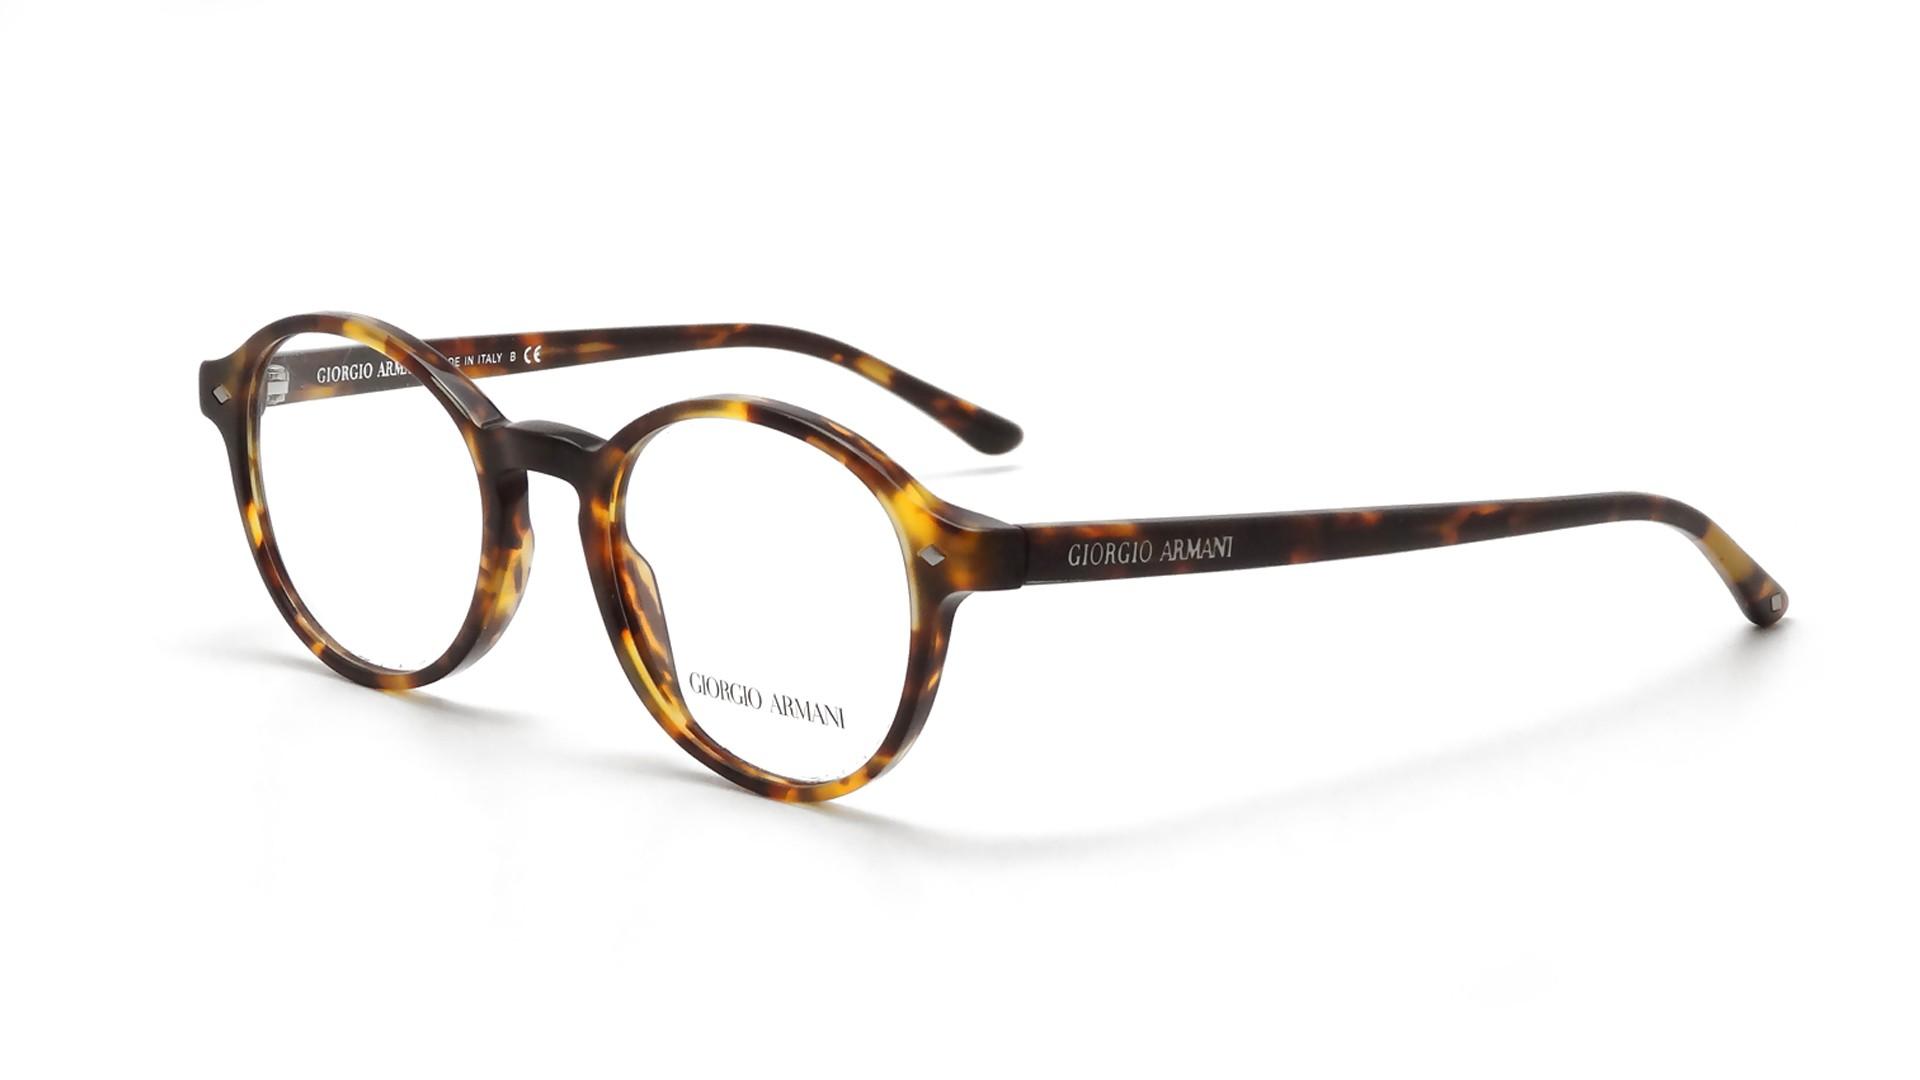 Glasses Frames Armani : Giorgio Armani Frames of Life Tortoise AR7004 5011 47-19 ...